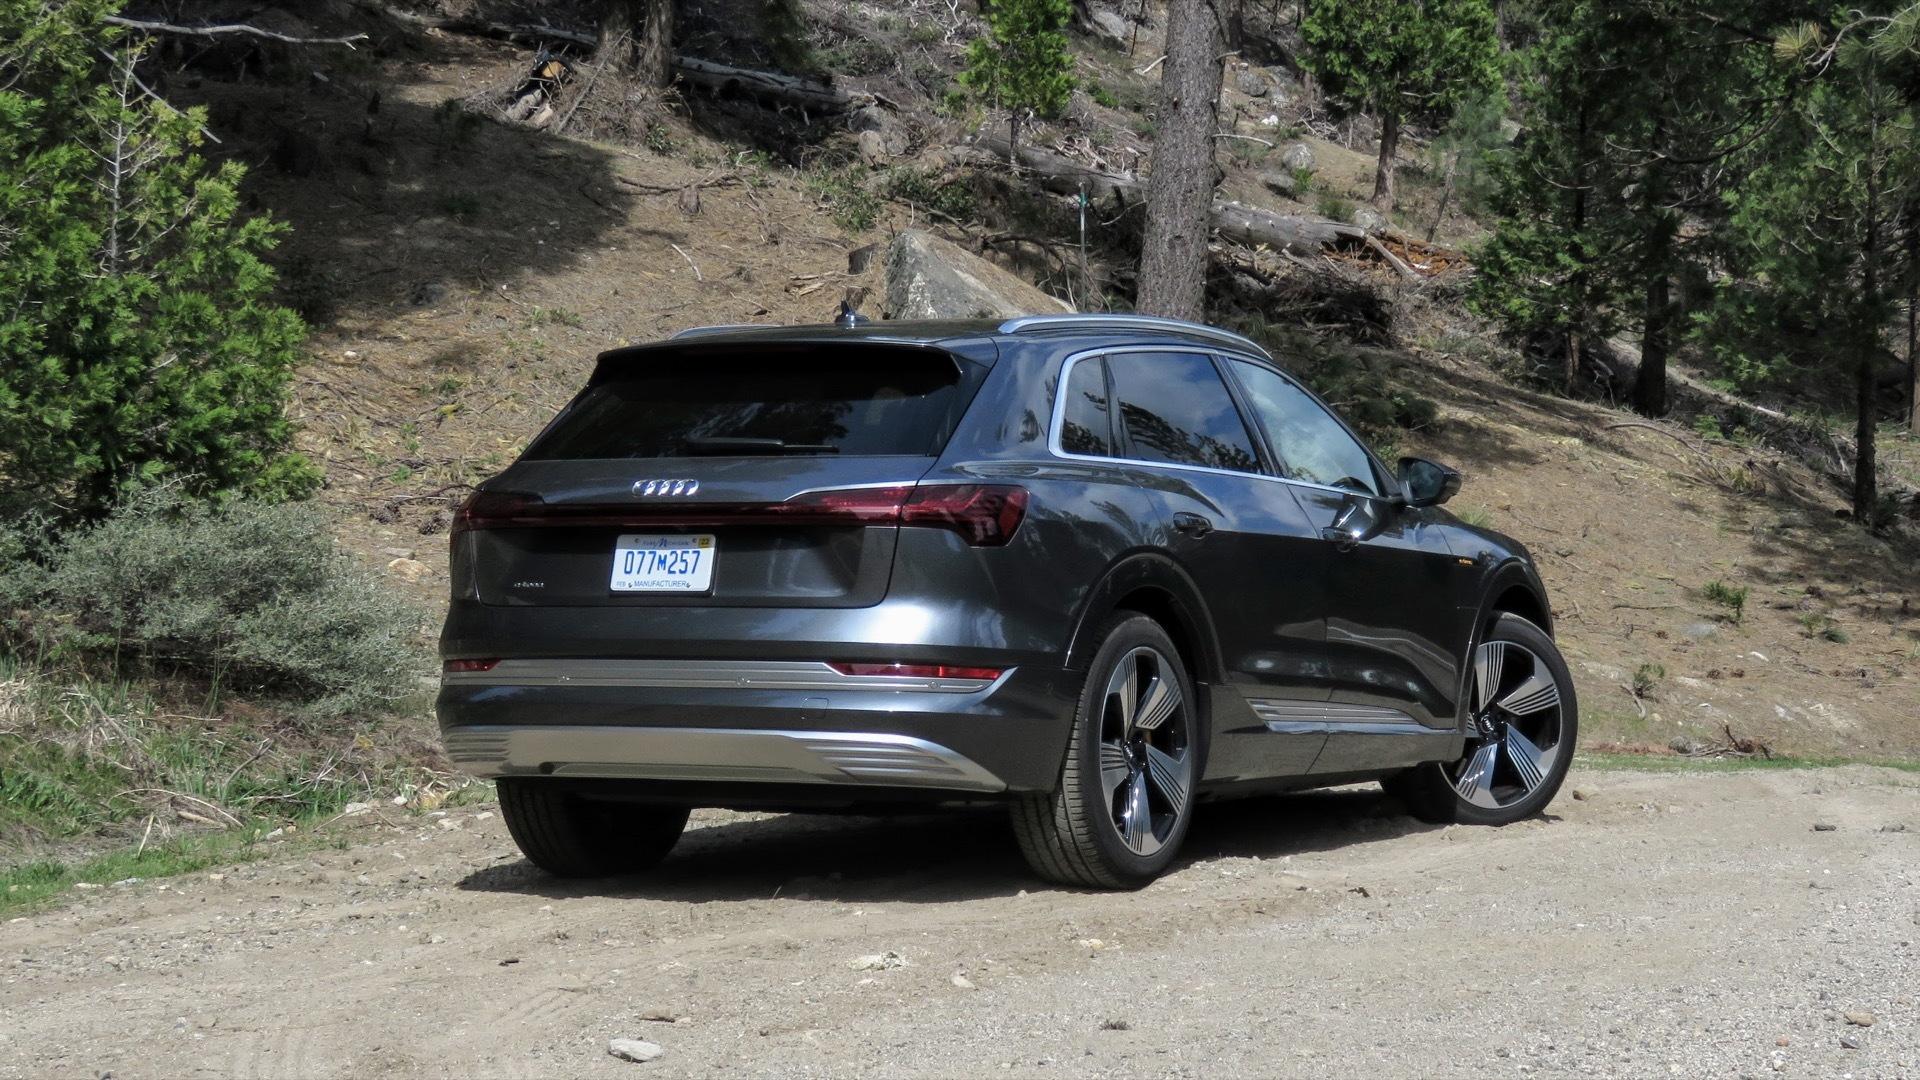 2019 Audi E-tron  -  first drive report  -  Calirornia, May 2019